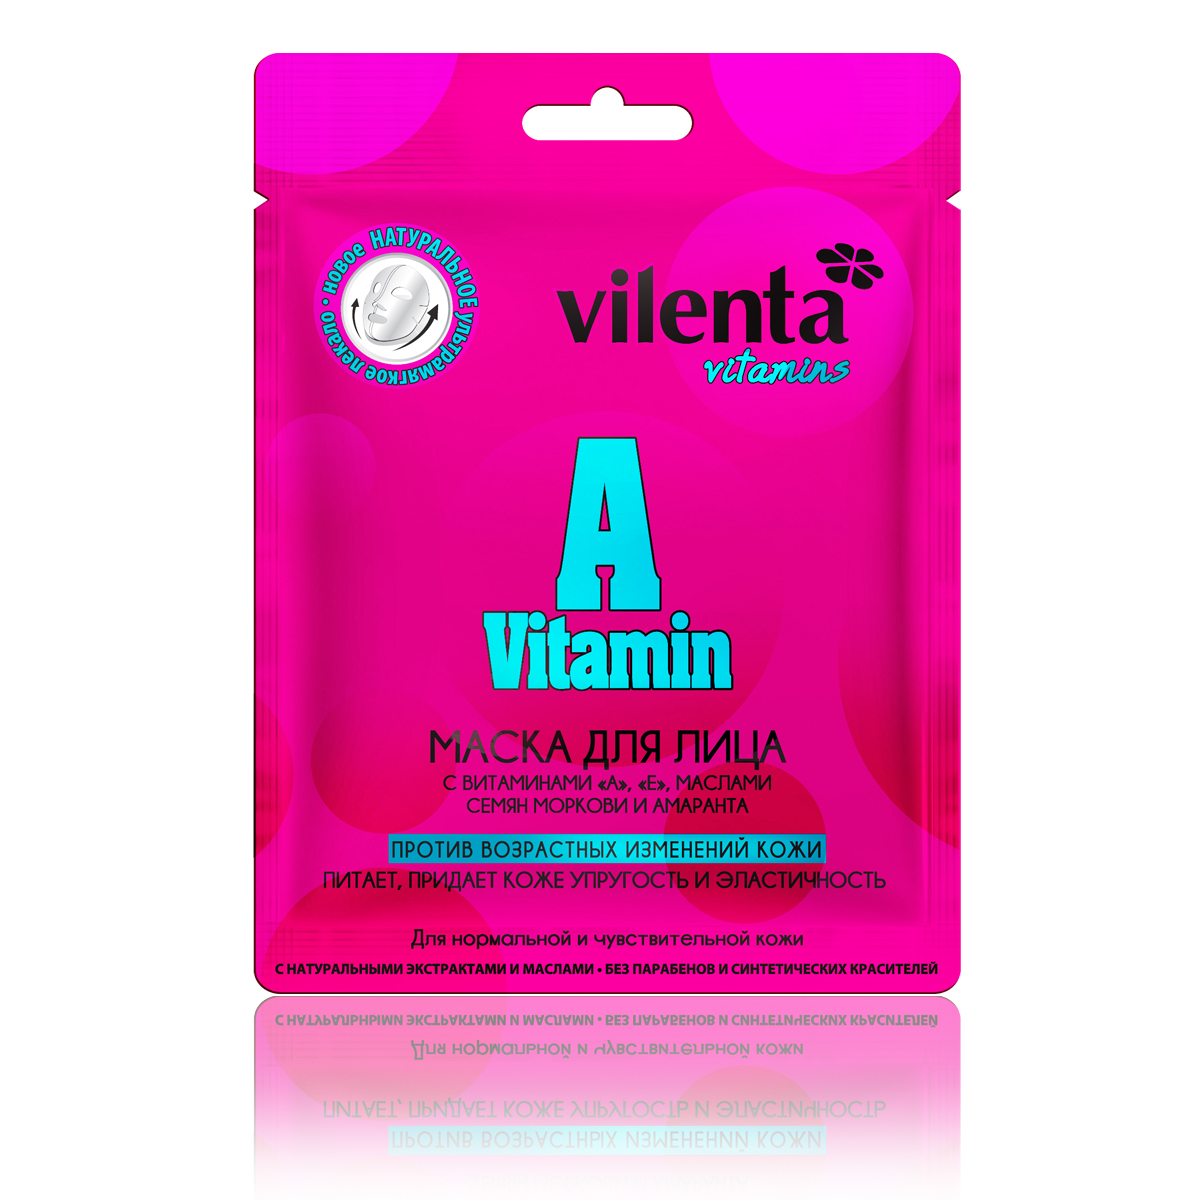 Фото - Vilenta Маска для лица Vitamin «А» с витаминами «А», «Е», маслами семня Моркови и Амаранта, 28 мл vilenta маска для лица vitamin е с витаминами а е с маслами авокадо и арганы 28 мл